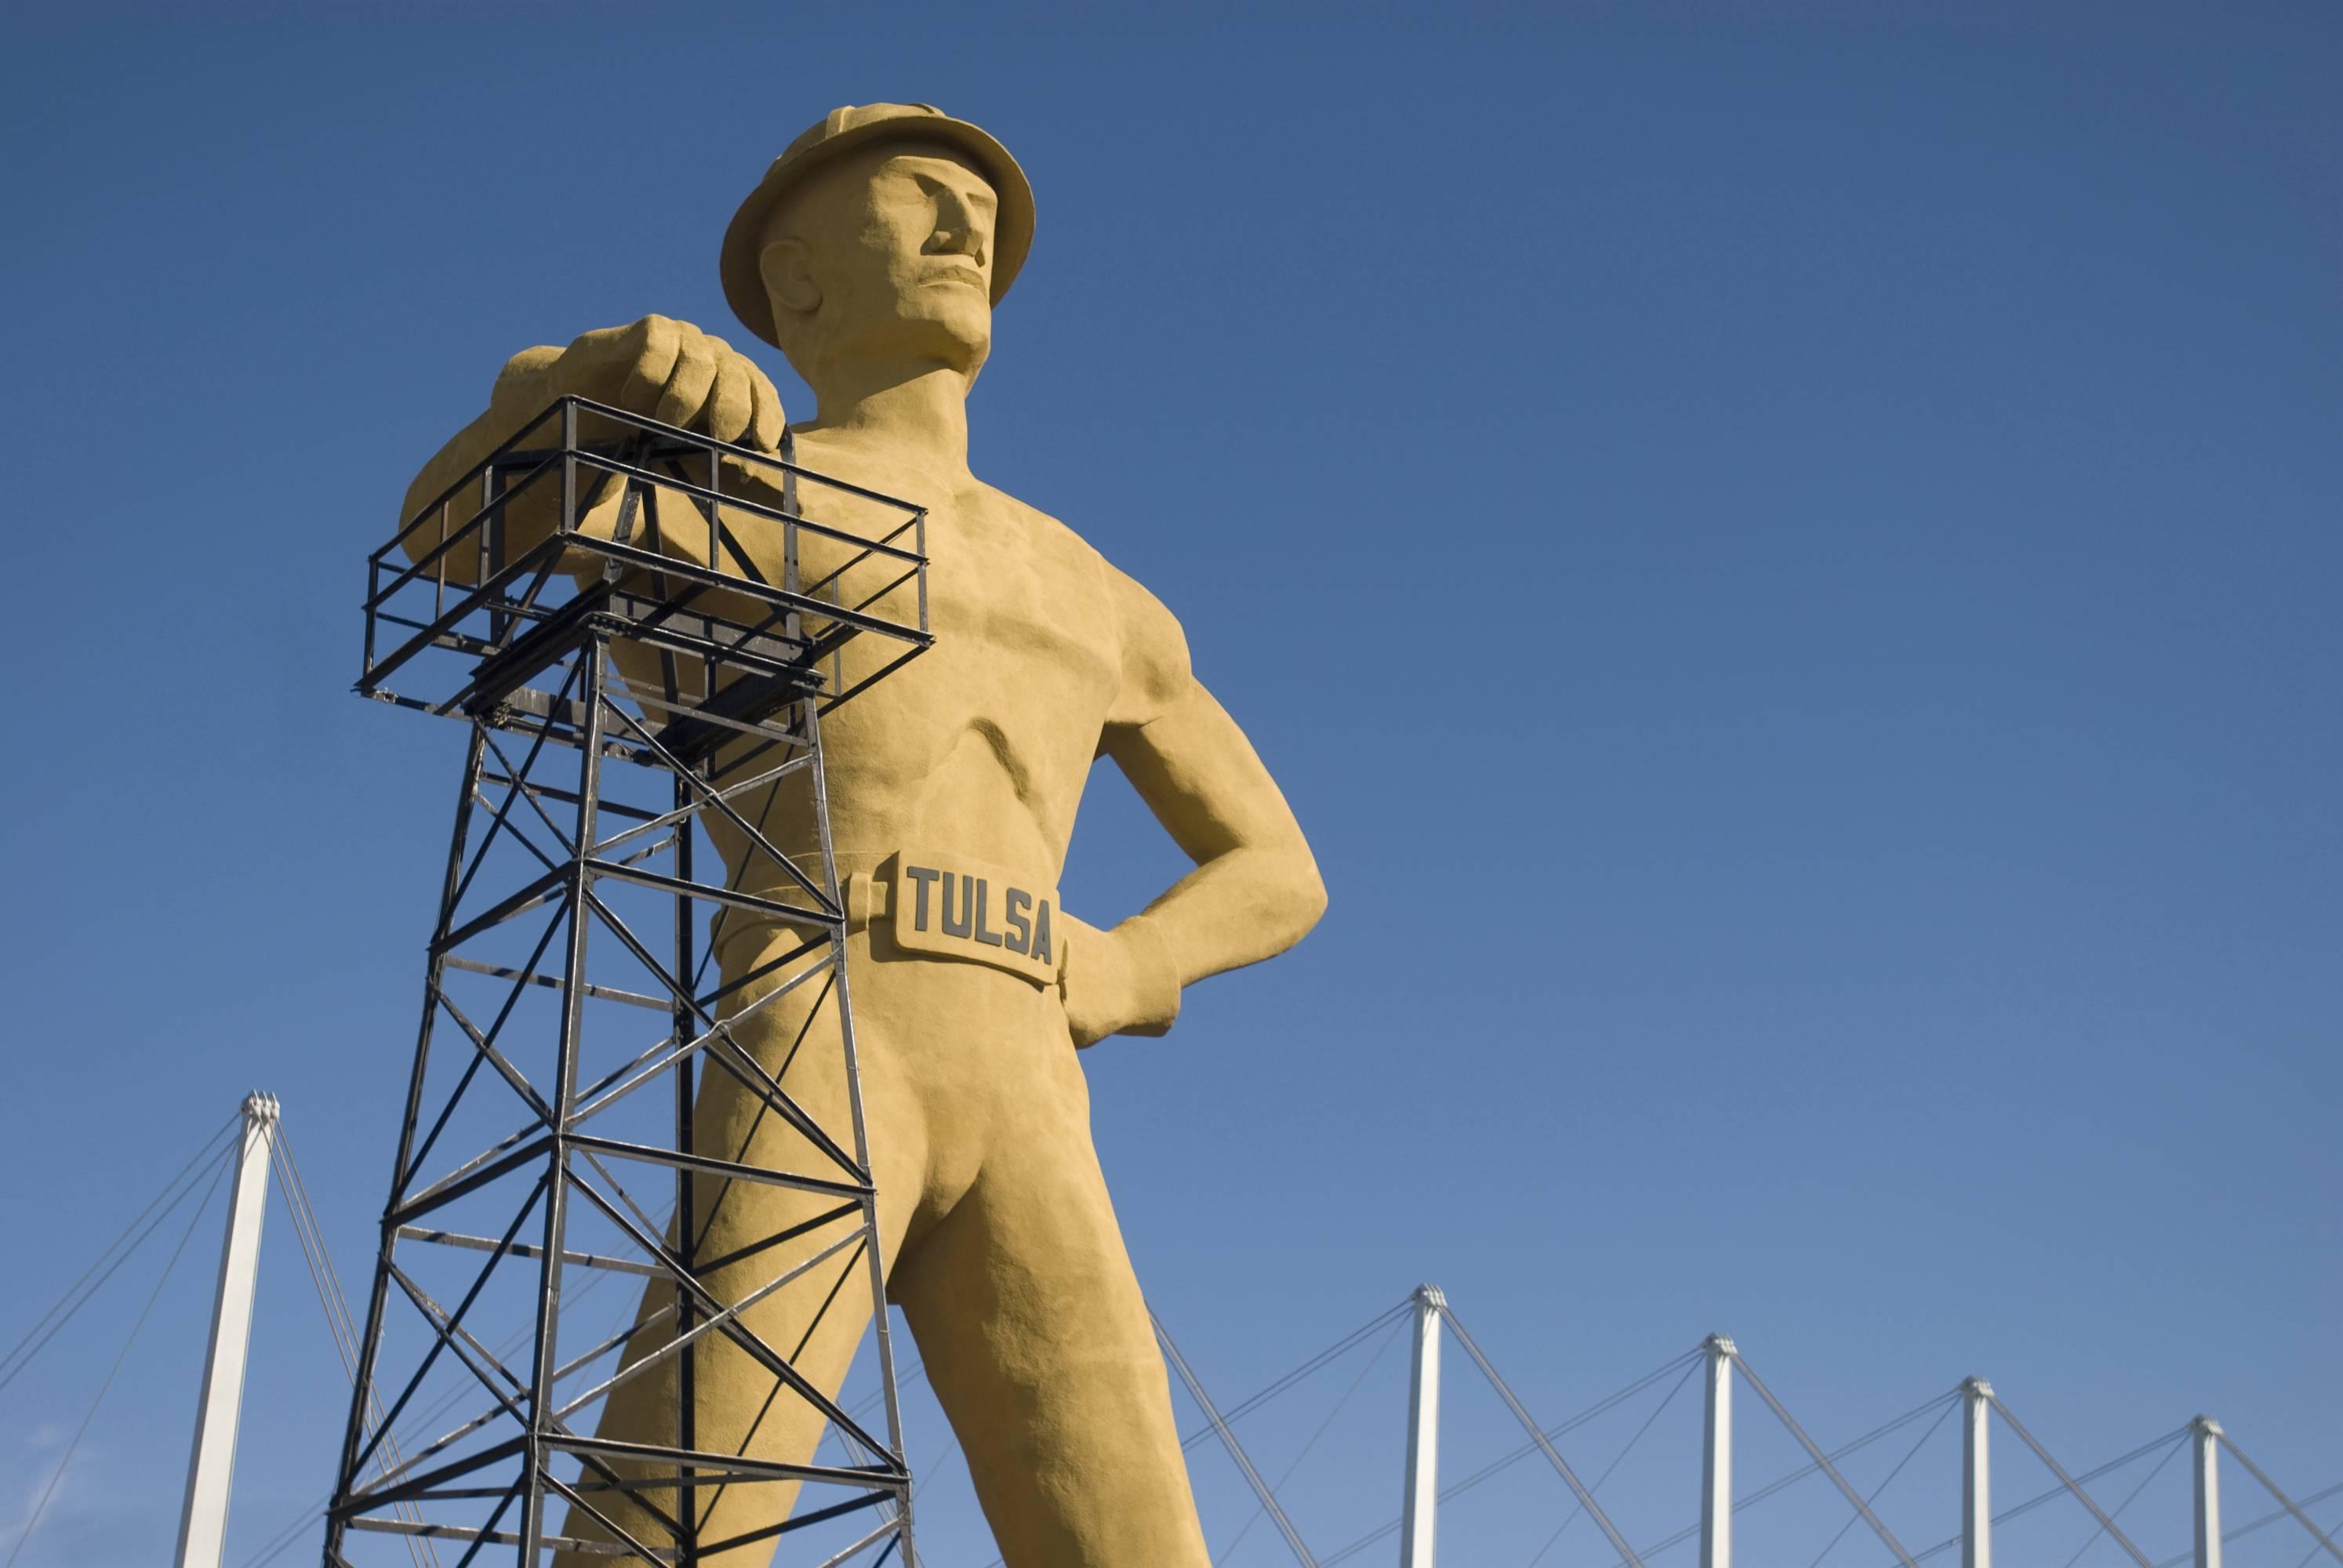 Tulsa Fairgrounds